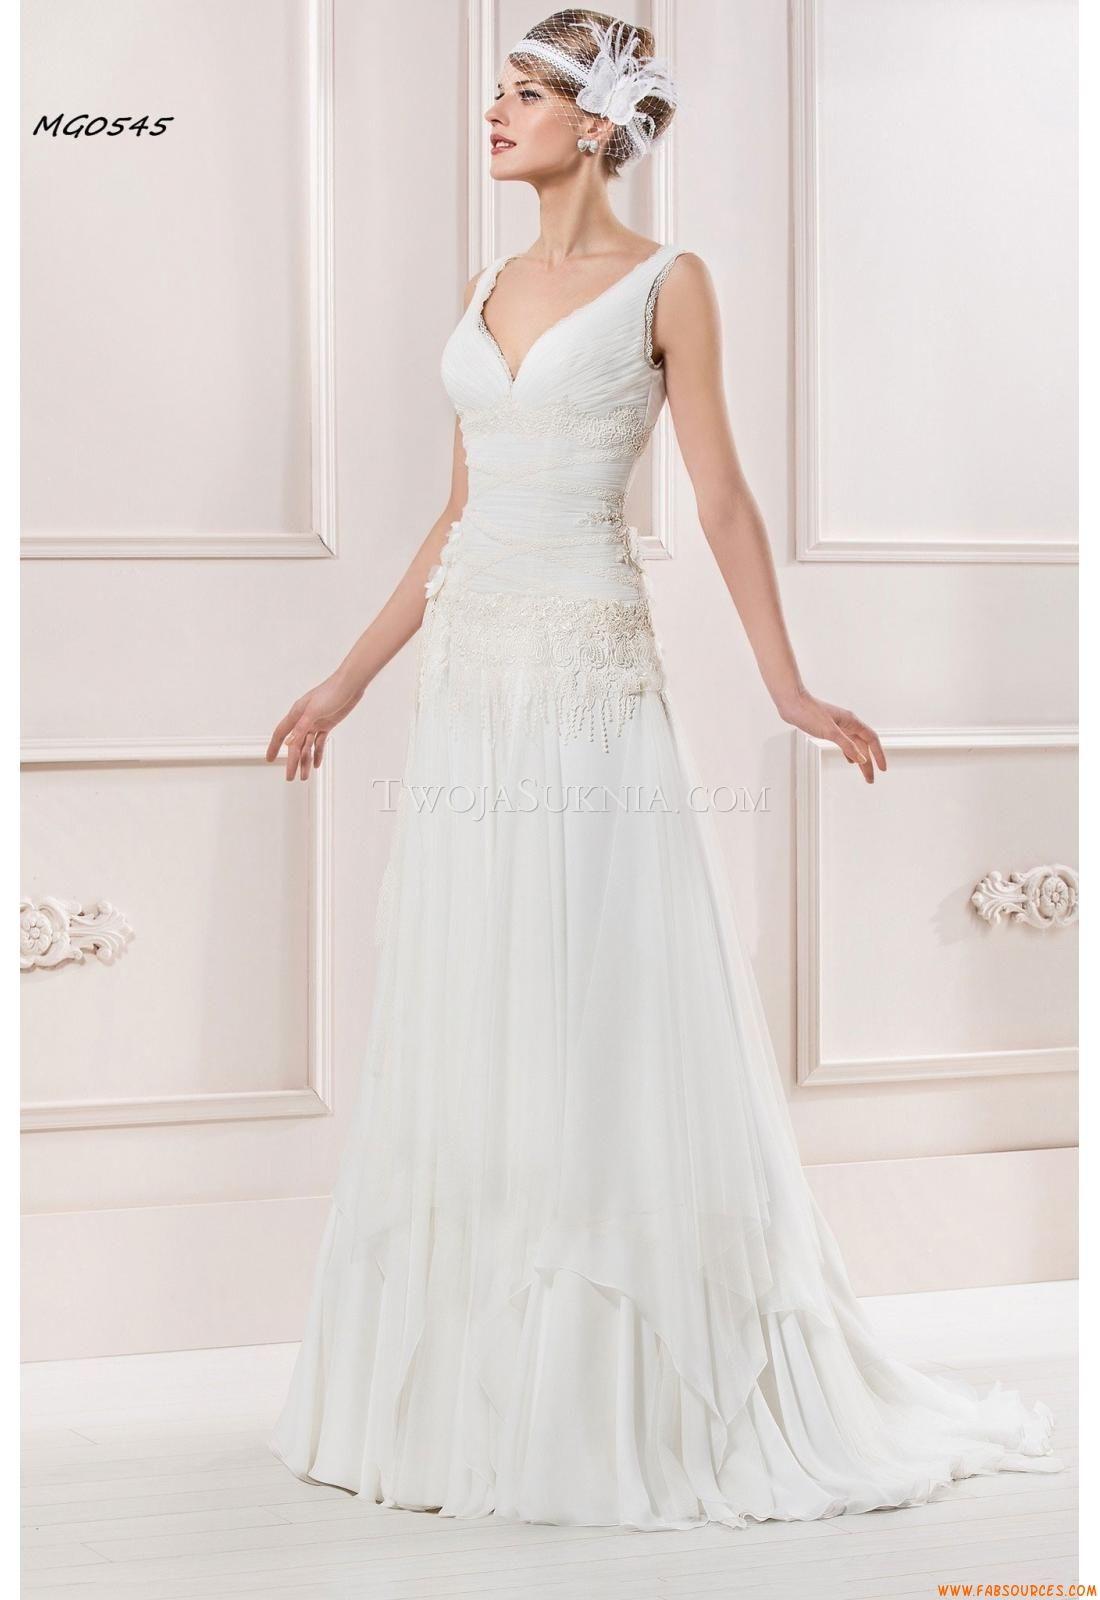 Robes de mariée manu garcía mg robe de mariage